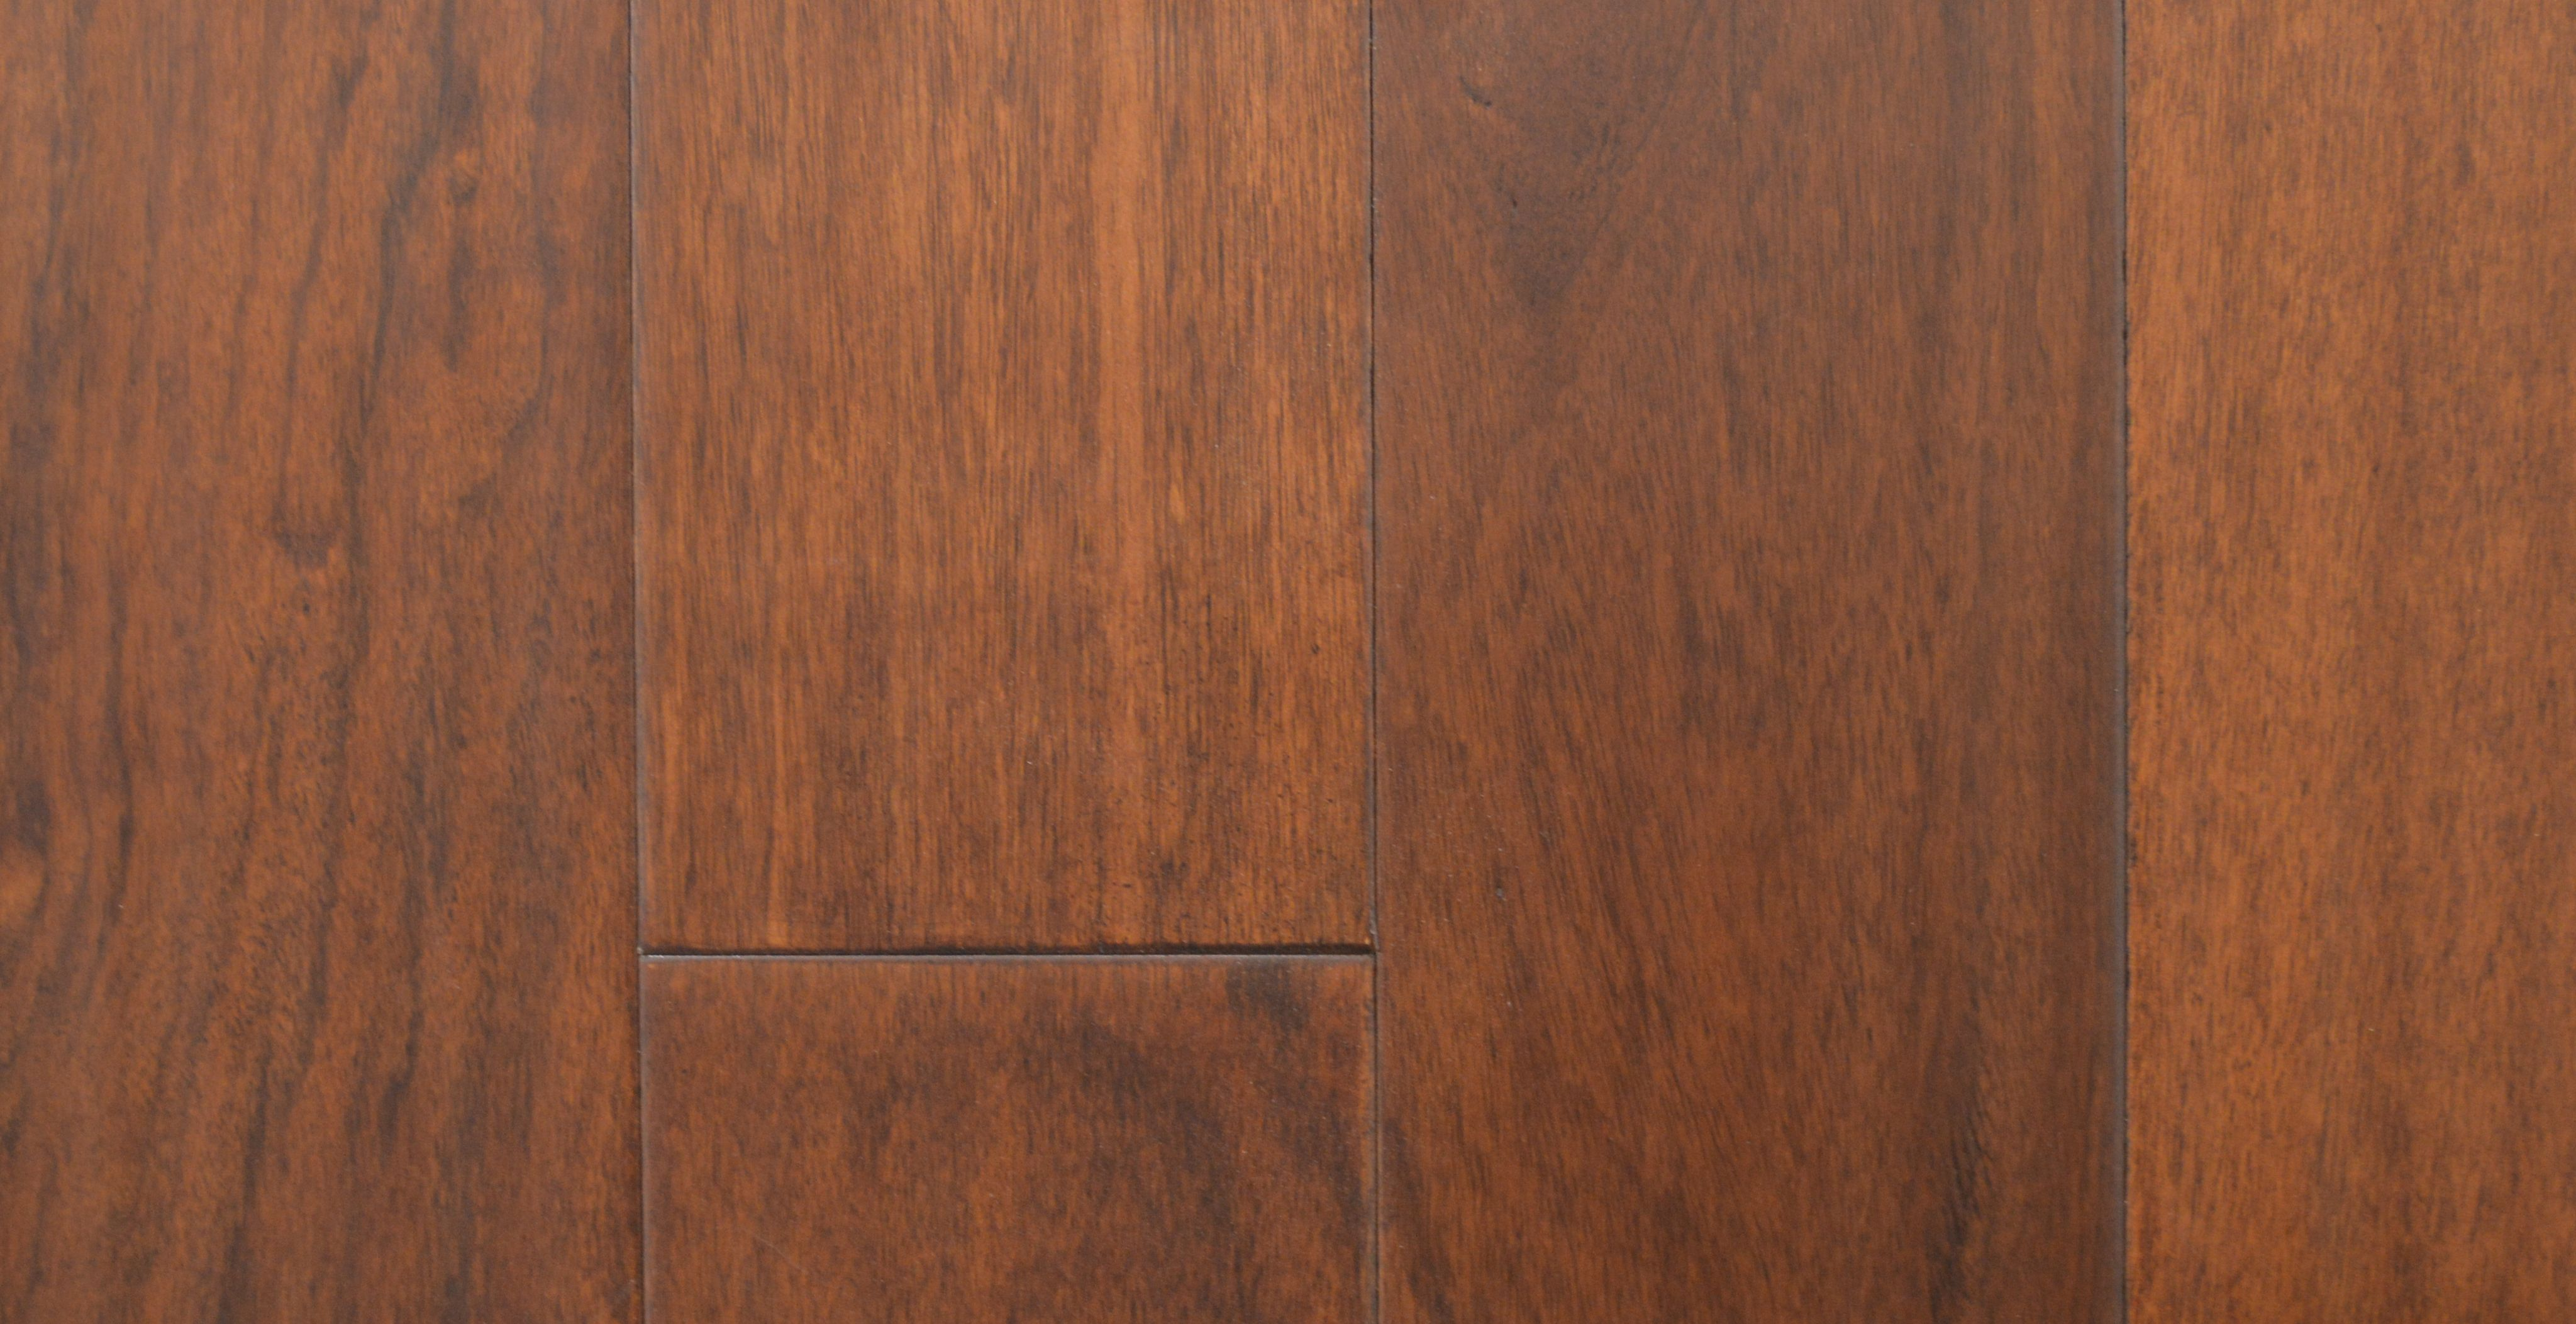 Del Ray 7 X 1 2 Sienna Hickory Level 3 Wood Flooring